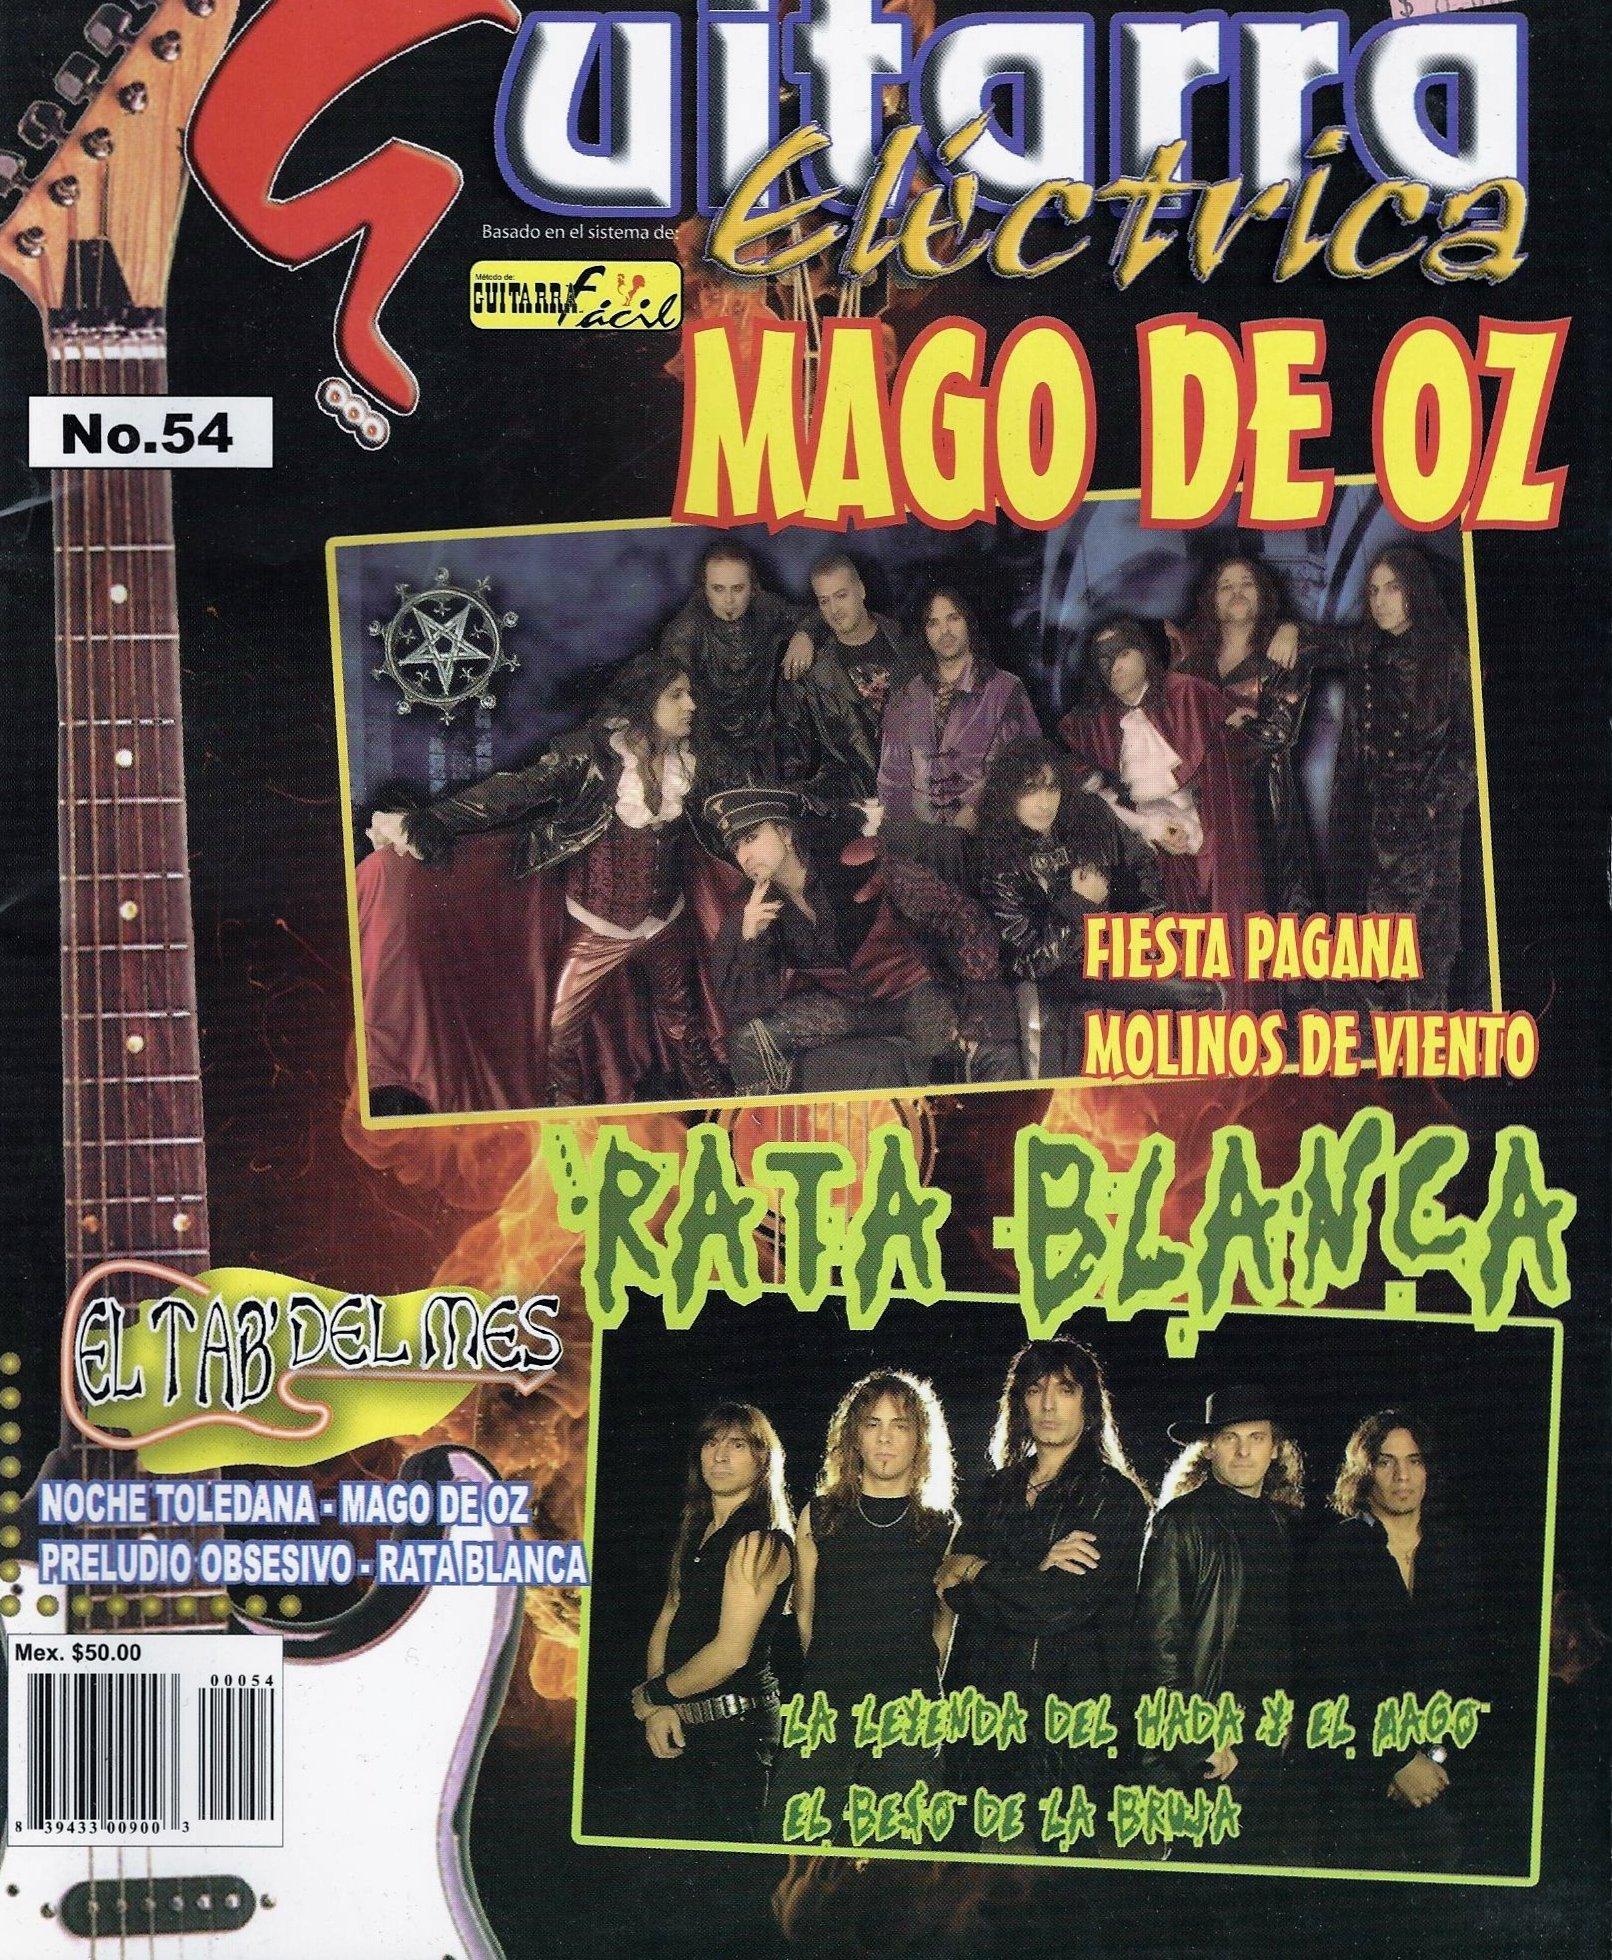 Guitarra Electrica No. 54 Mago De Oz Rata Blanca Metodo Guitarra Facil (Guitarra Electrica No. 54 Mago De Oz Rata Blanca Metodo Guitarra Facil, NO.